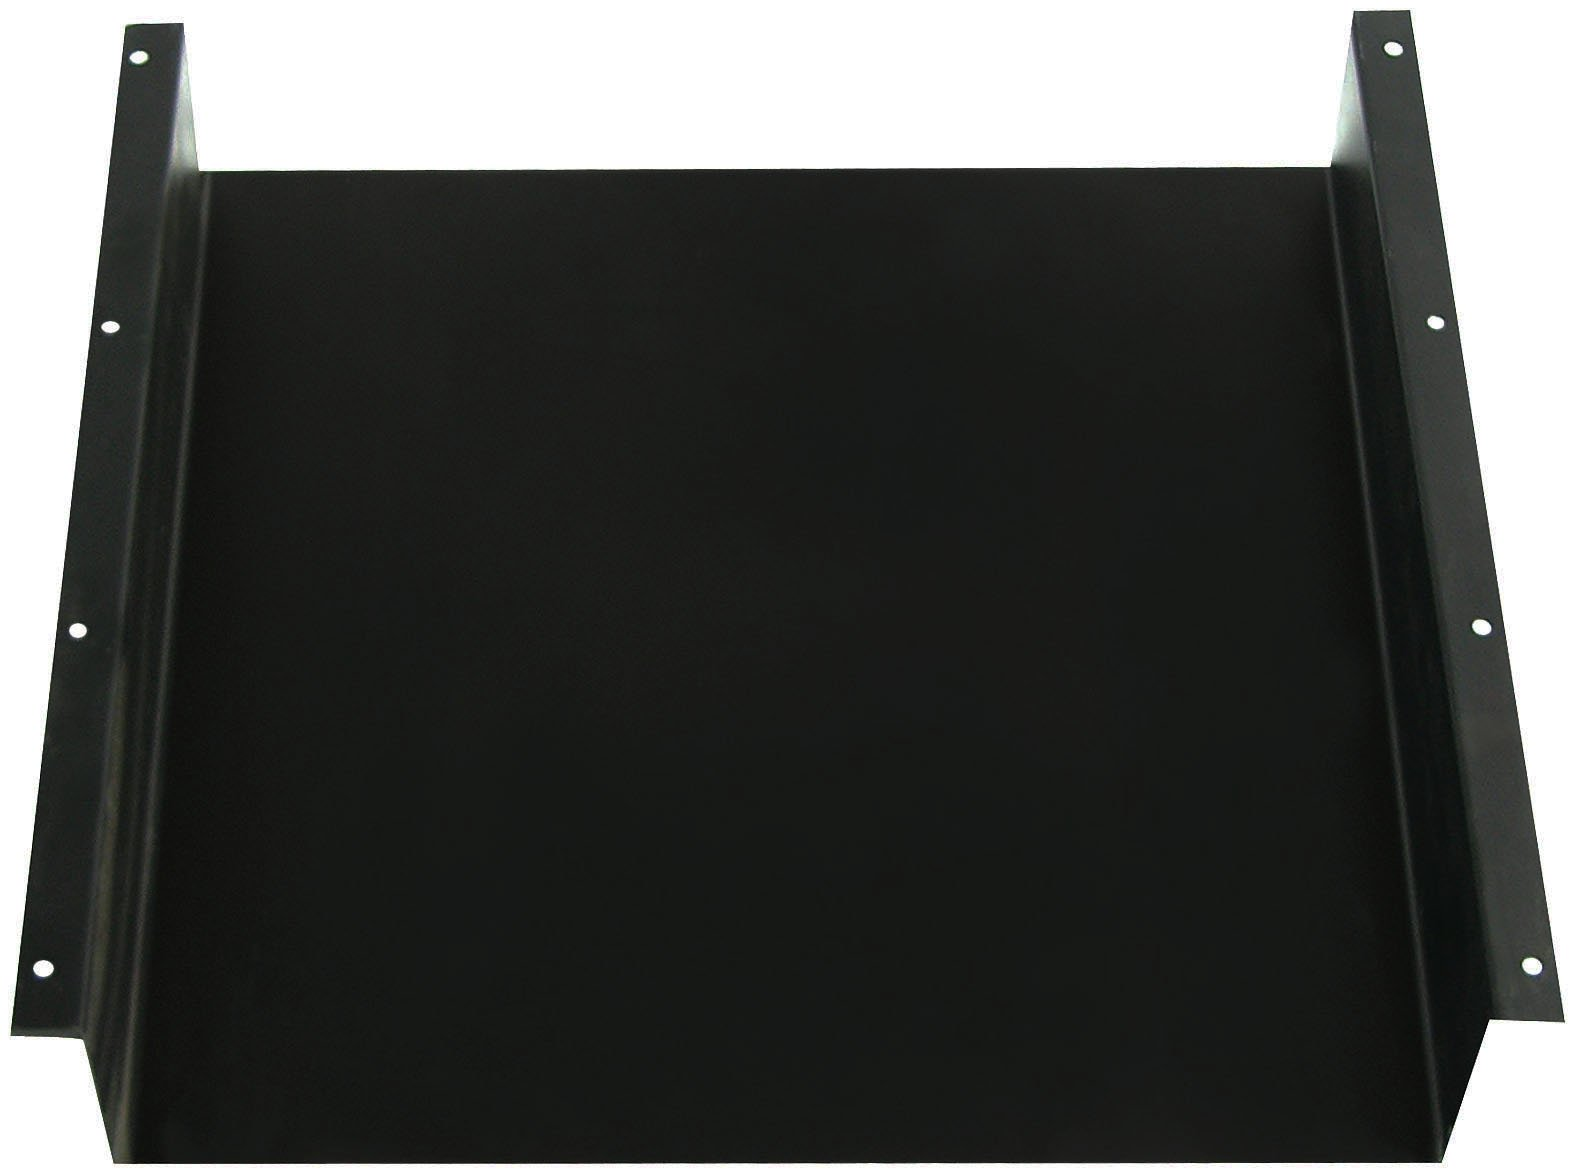 Odyssey ARSTC Flat Rack Mount Metal Tray